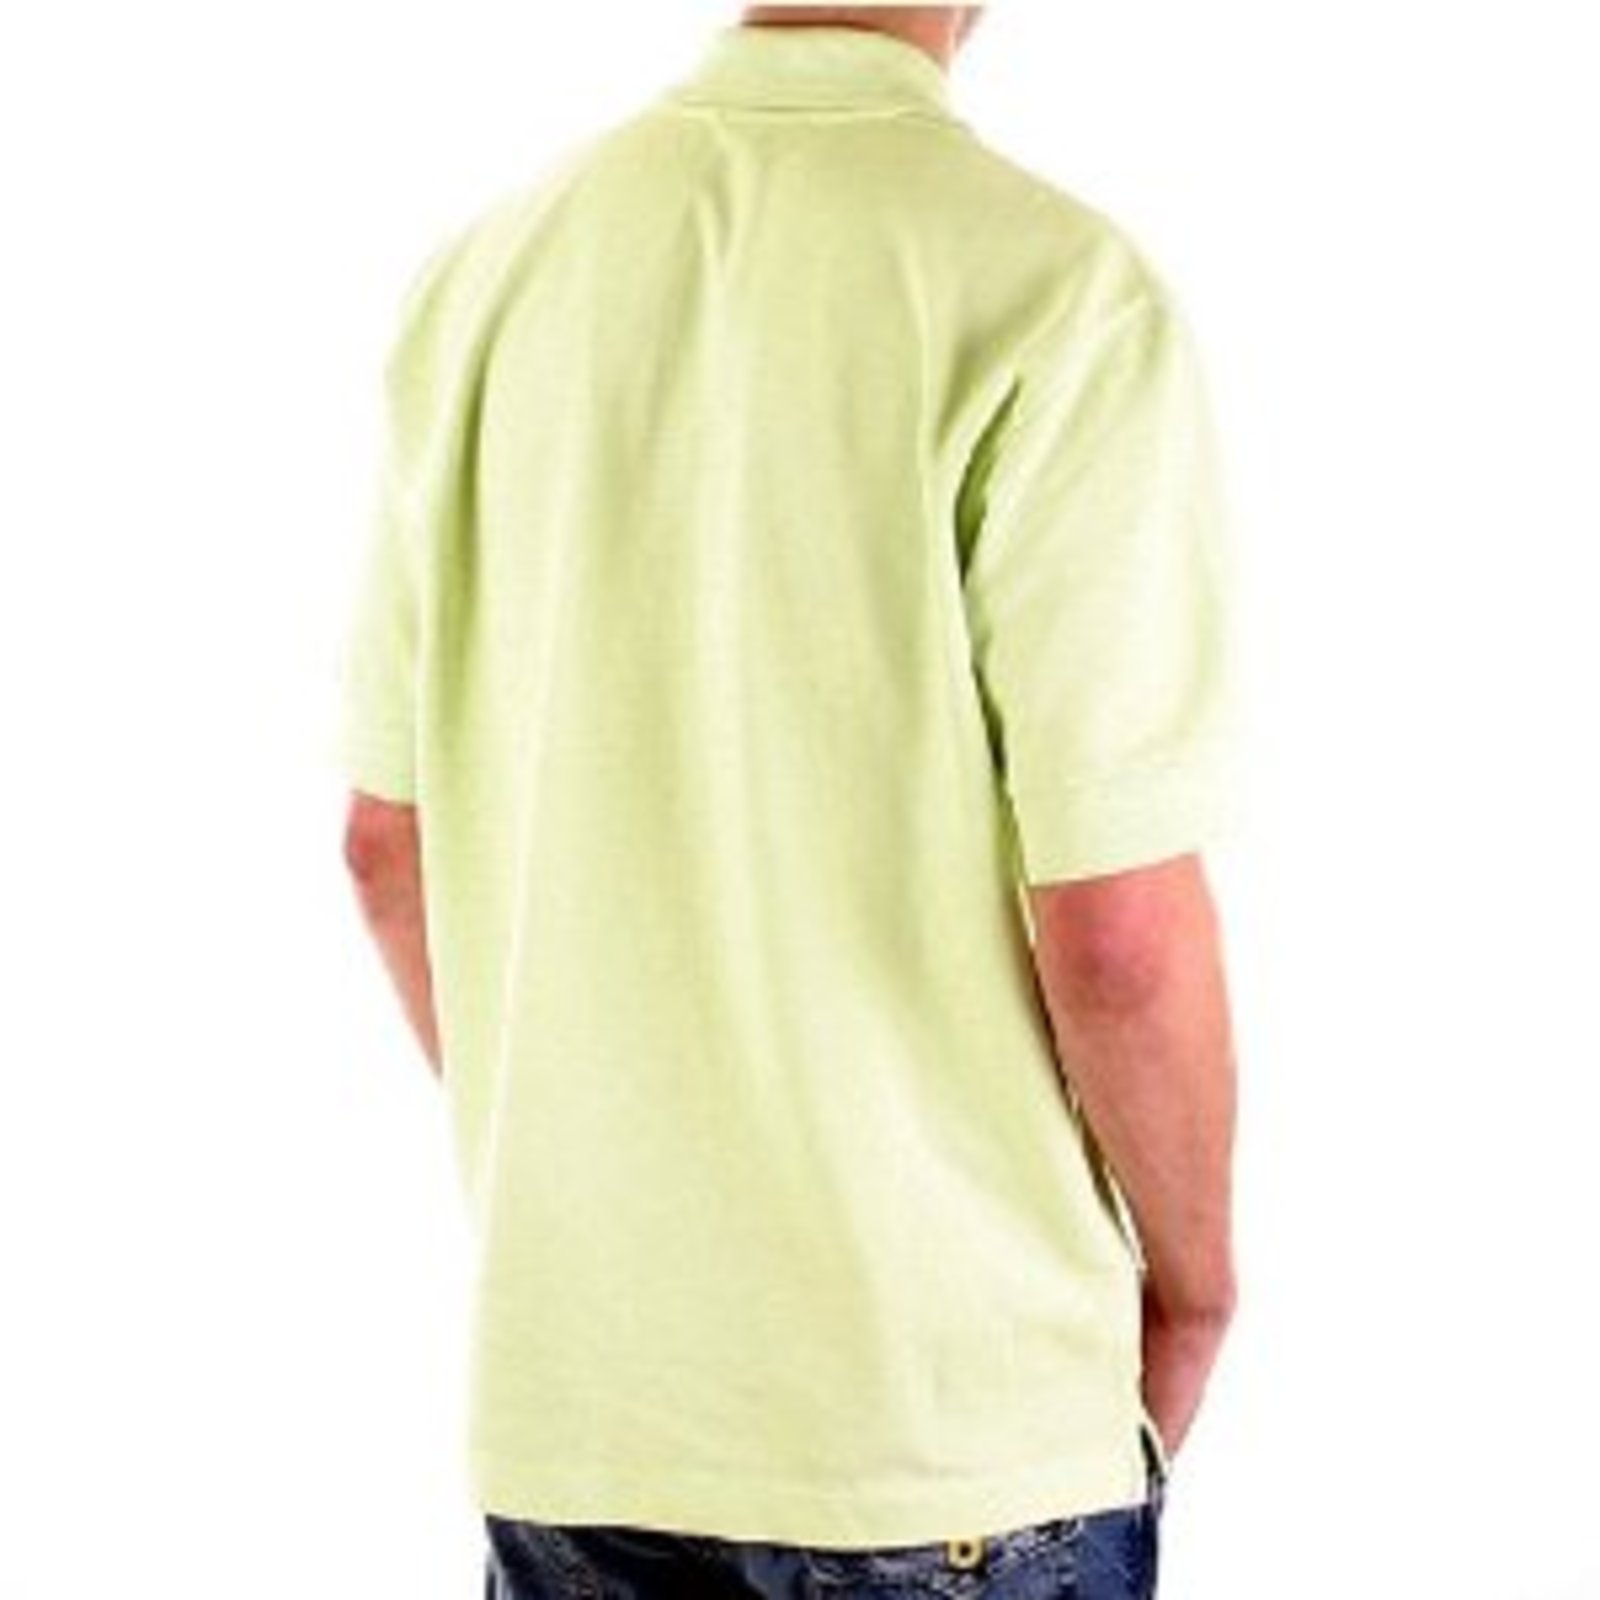 Stone Island Polo T Shirt Mens Lime Pique Polo Shirt